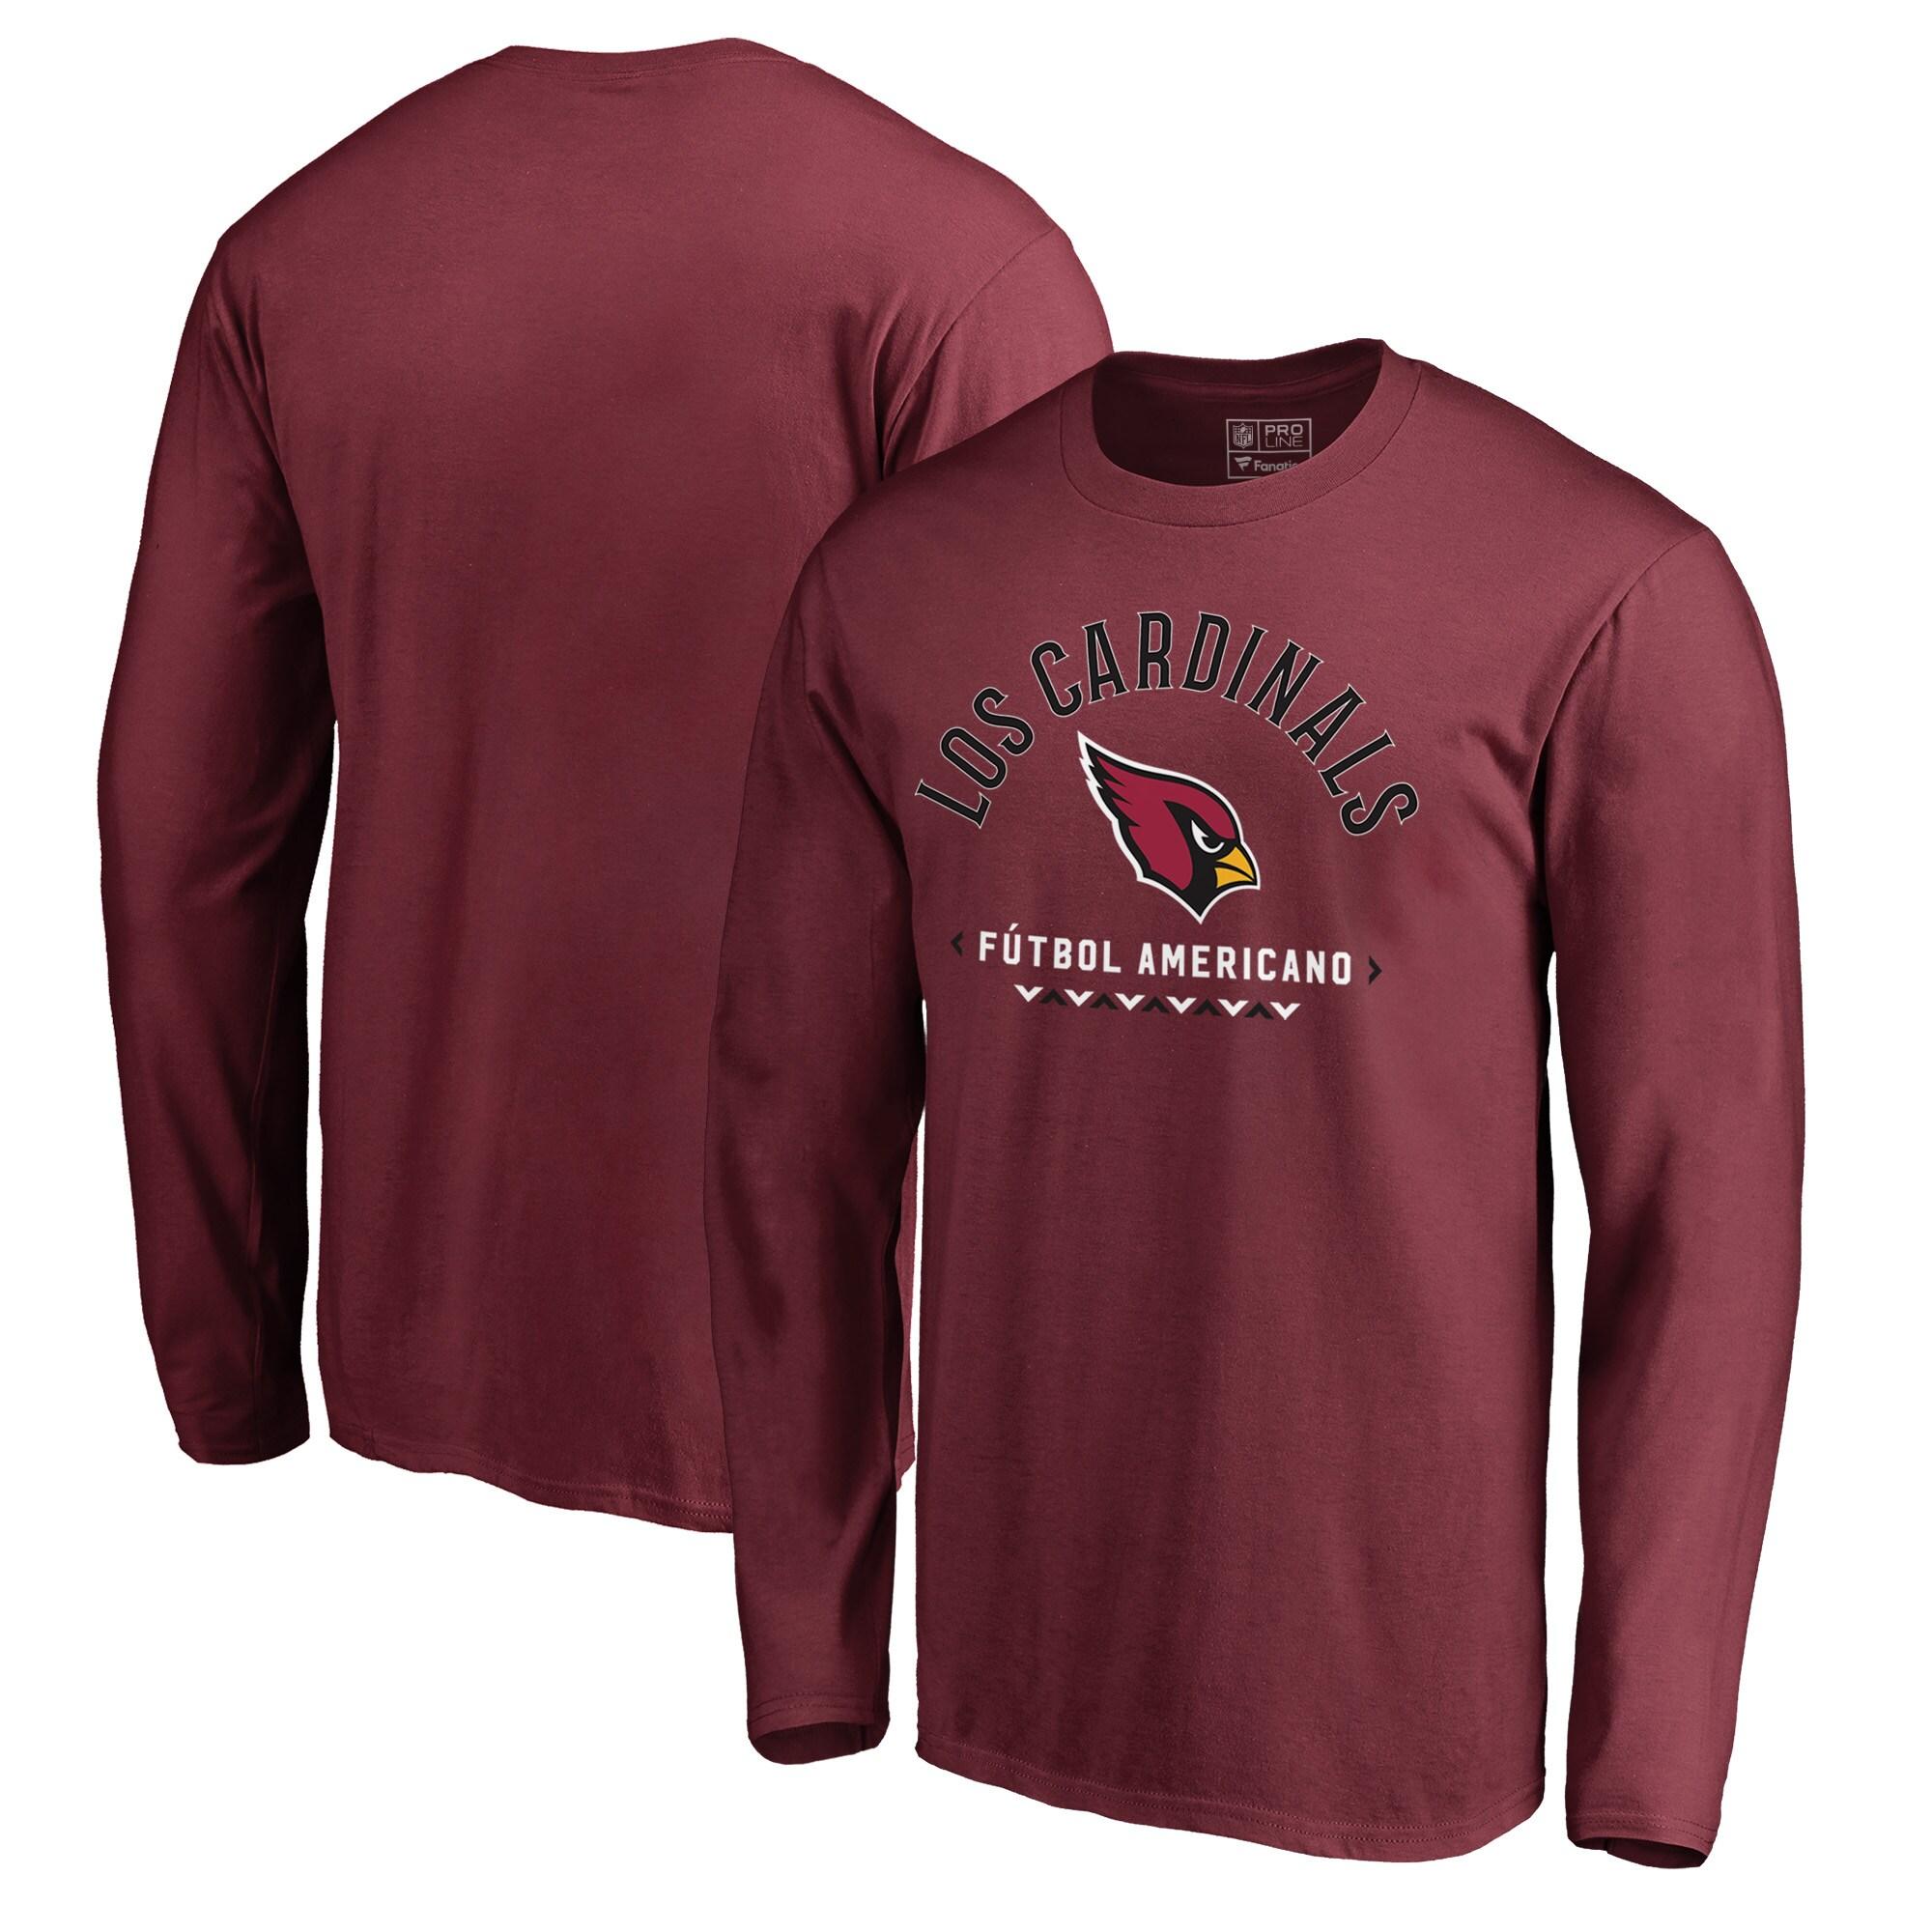 Arizona Cardinals NFL Pro Line by Fanatics Branded Futbol Americano Long Sleeve T-Shirt - Cardinal